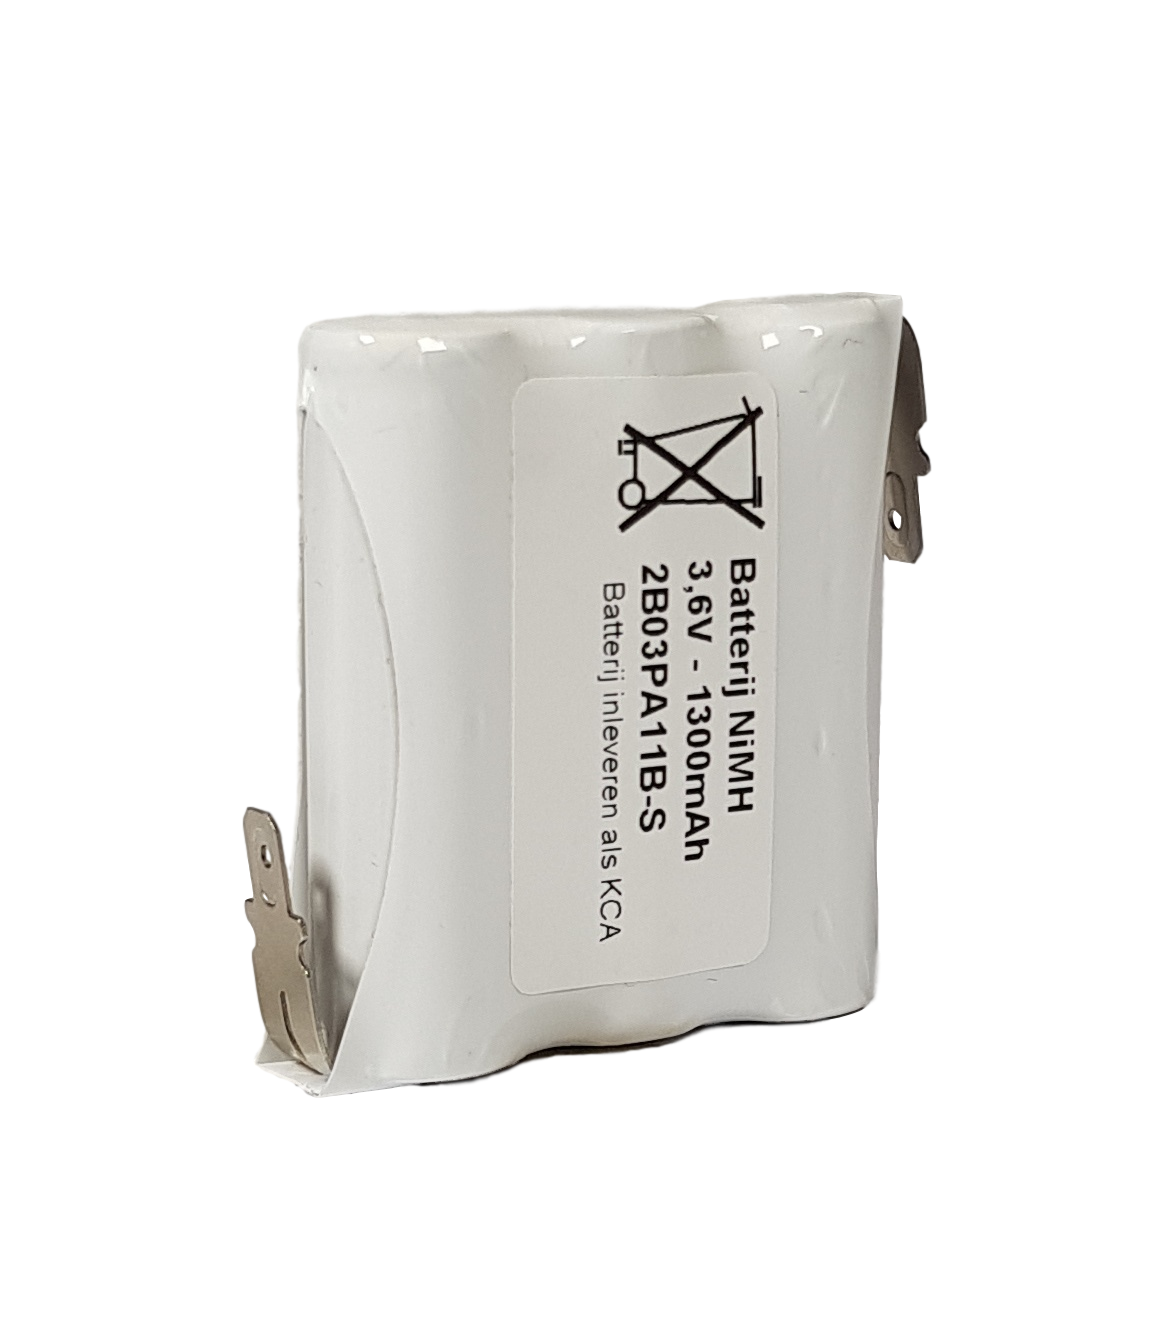 Noodverlichting accu NiMH 3,6V 1300mAh AA 3SBS - Faston 4,8mm